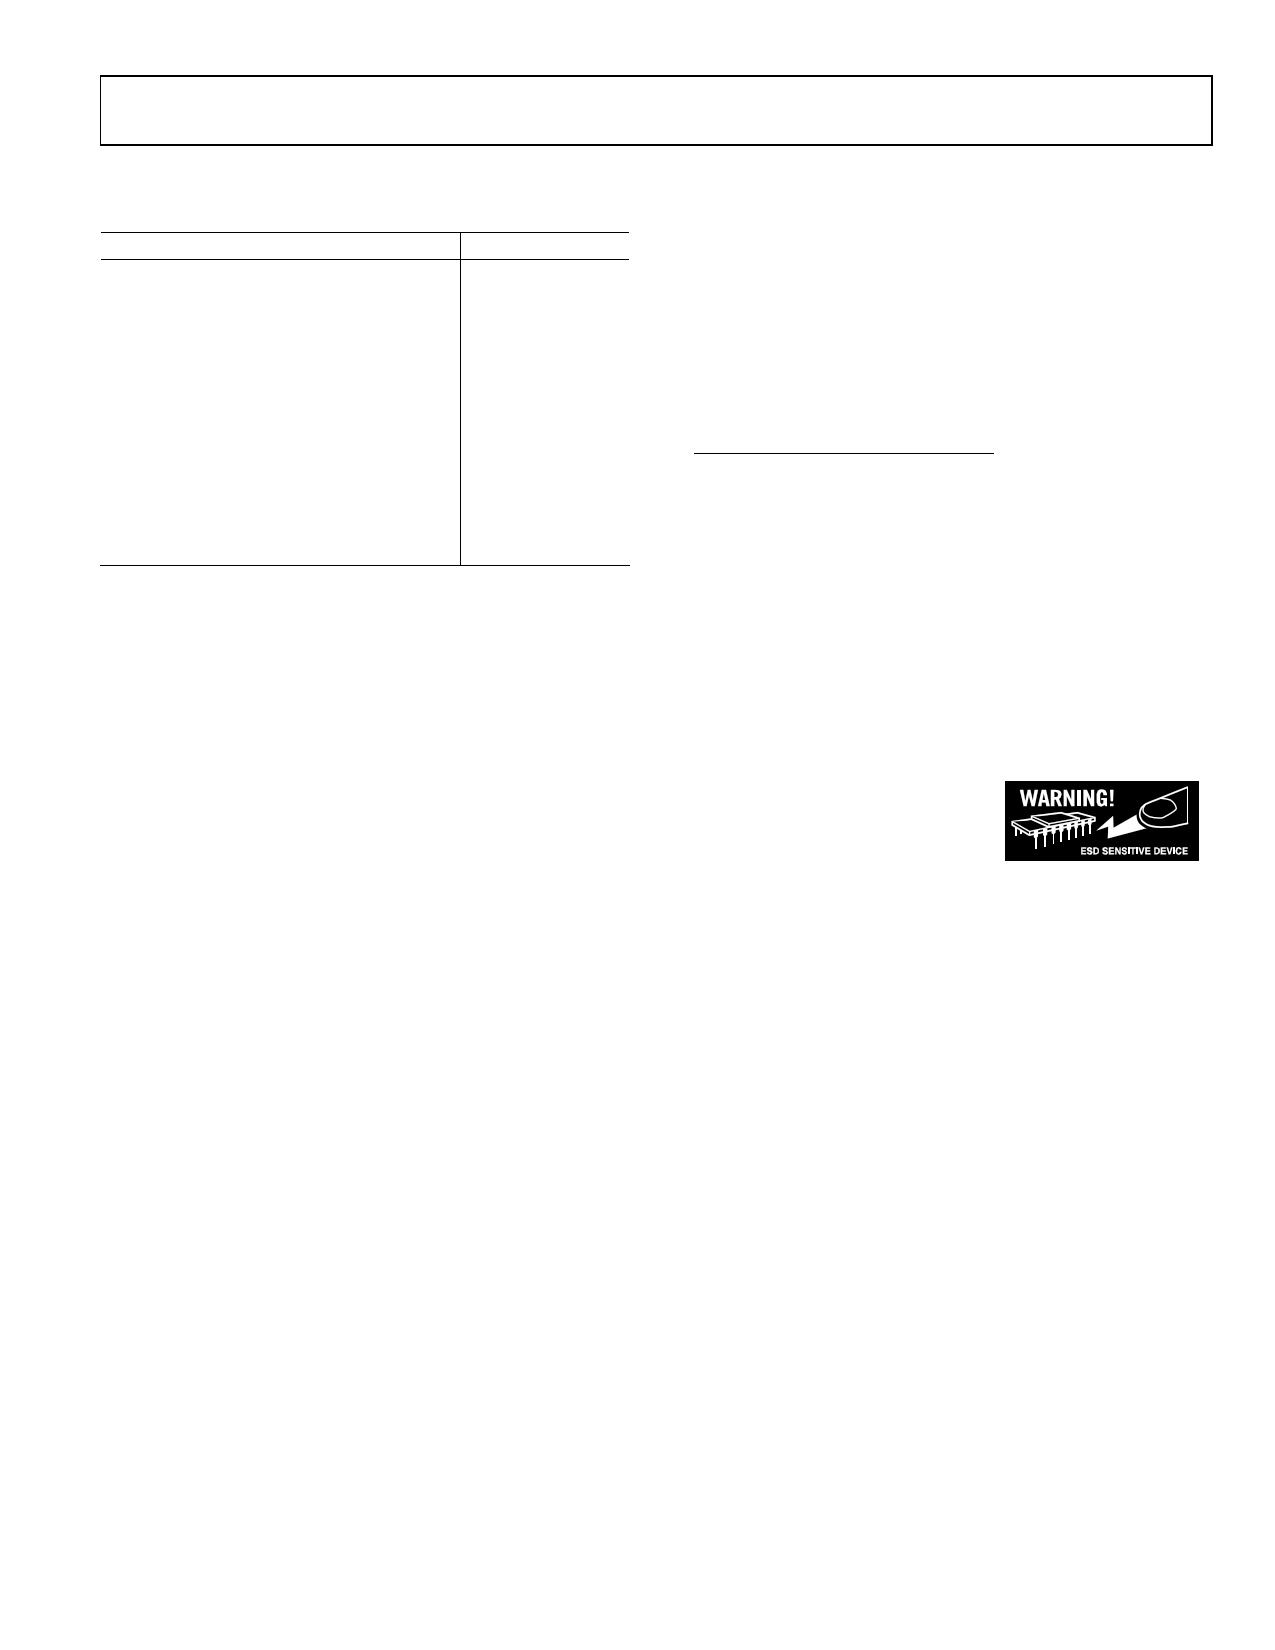 AD5547 pdf, arduino